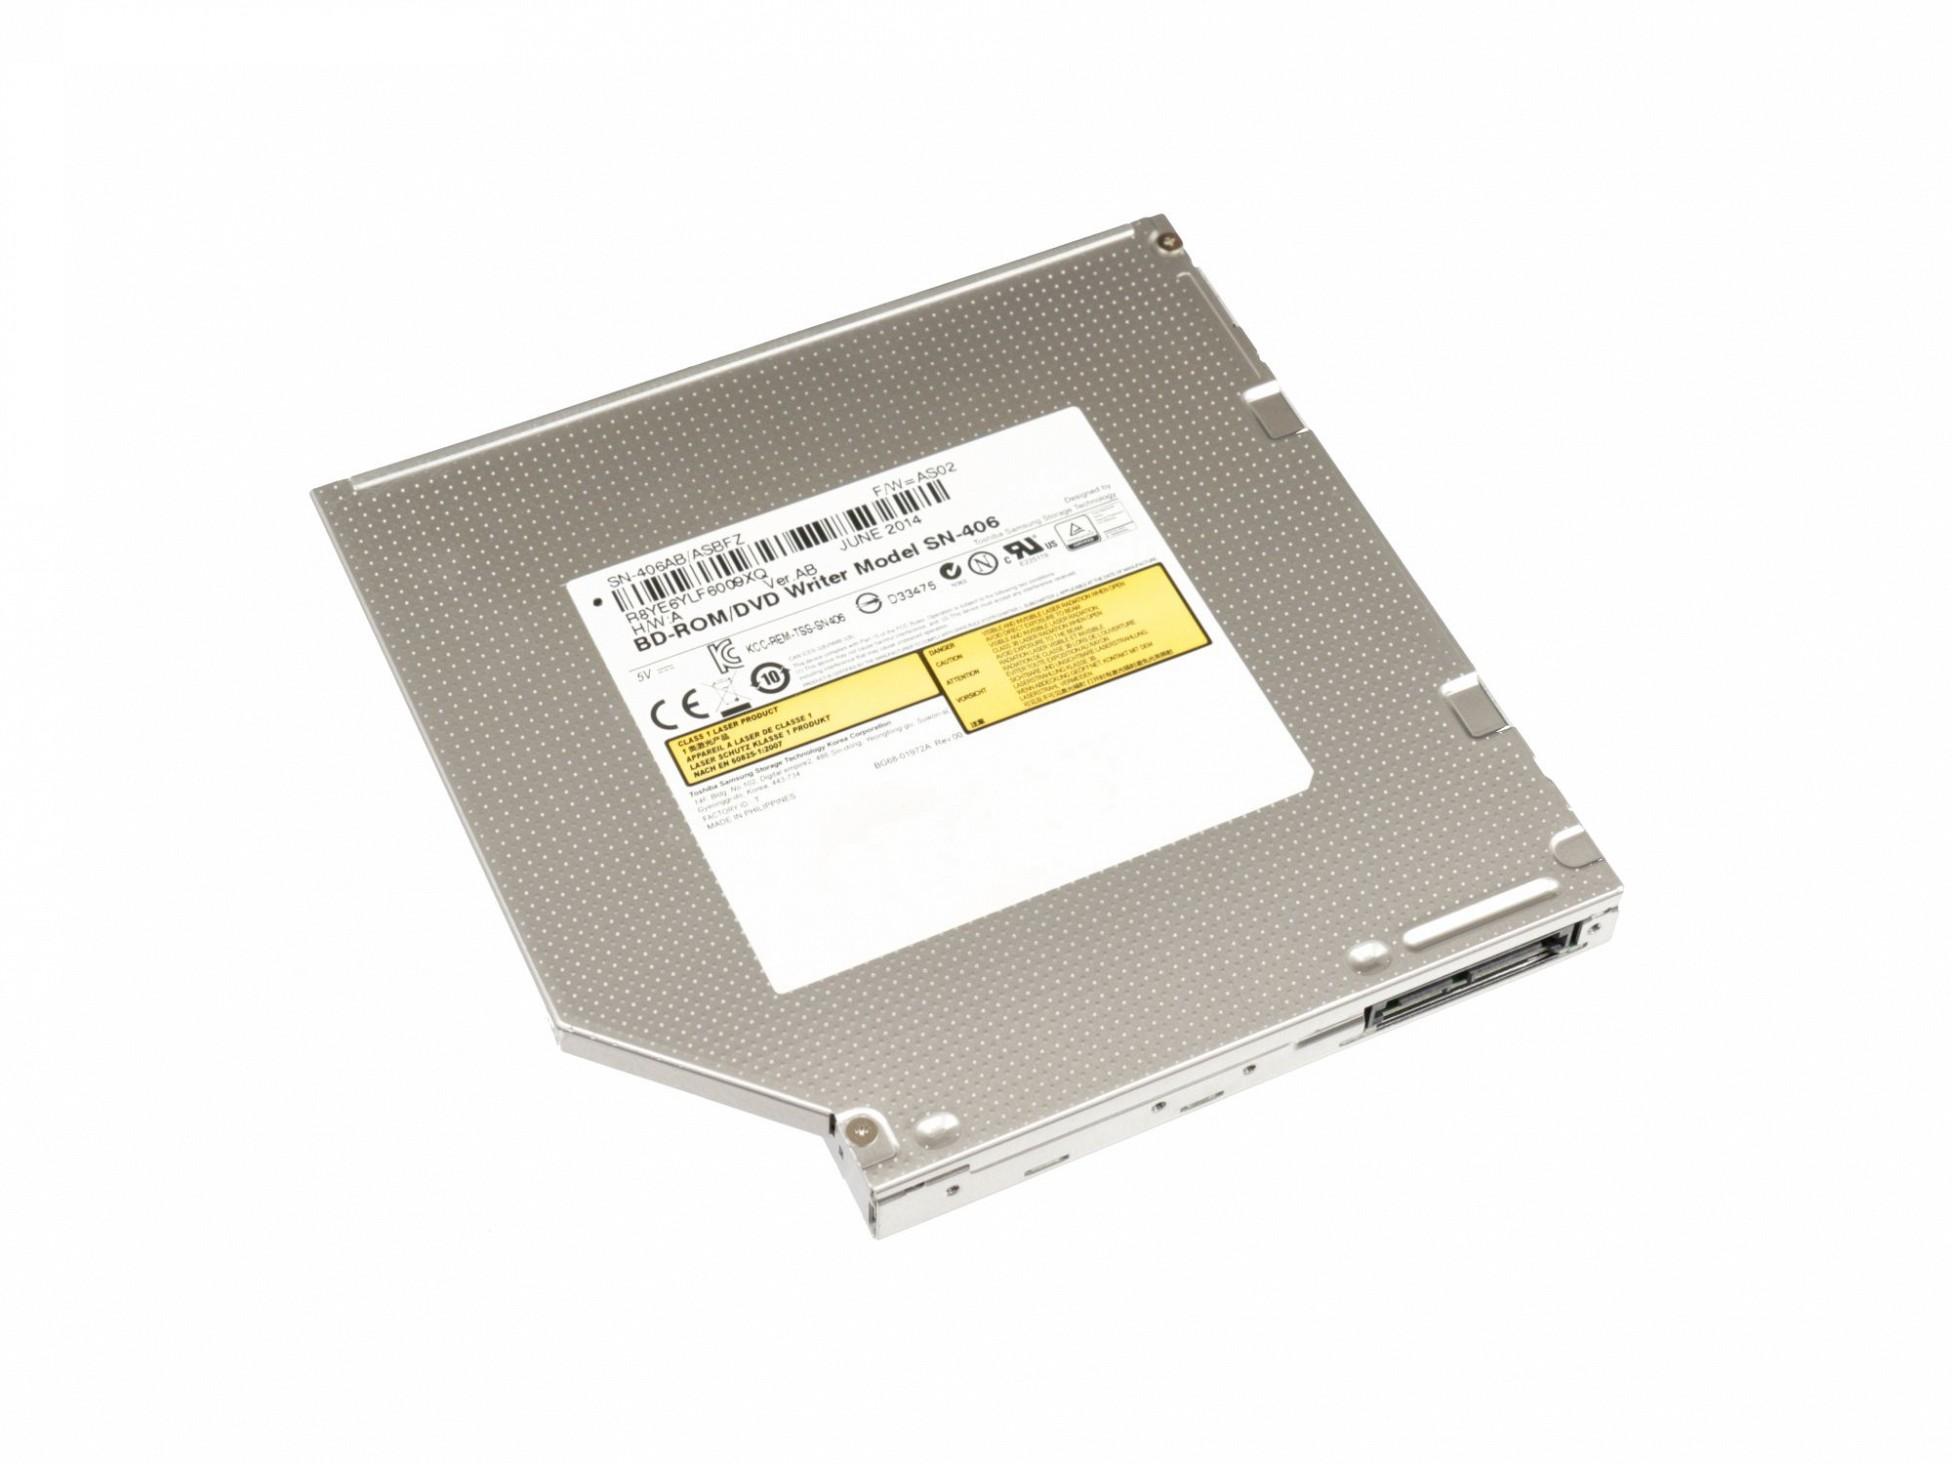 DVD / Blu-Ray Combo Laufwerk für Wortmann Terra Mobile 1509